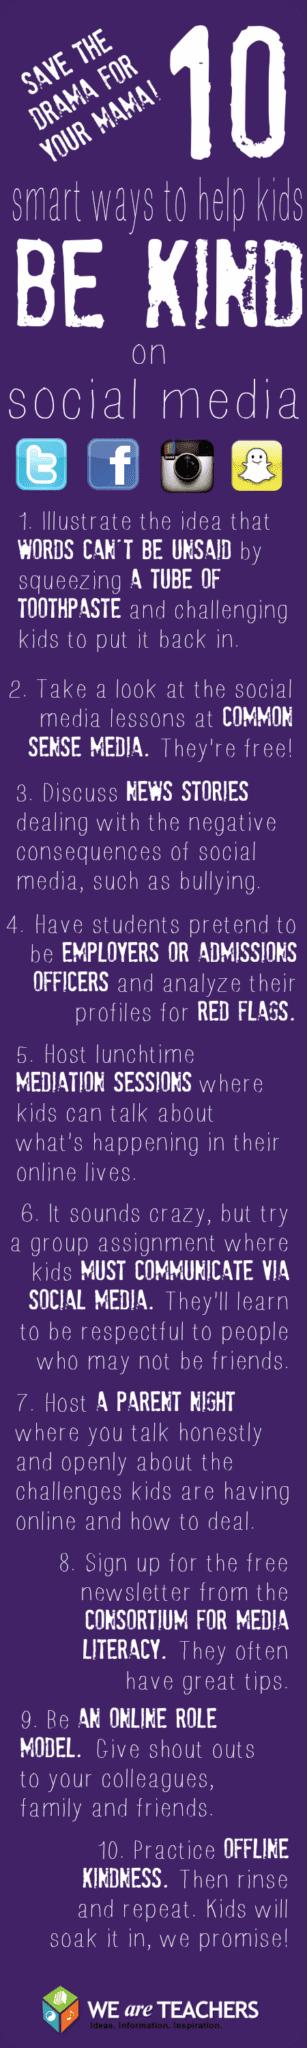 10 Smart Ways to Teach Kids to Be Kind Online